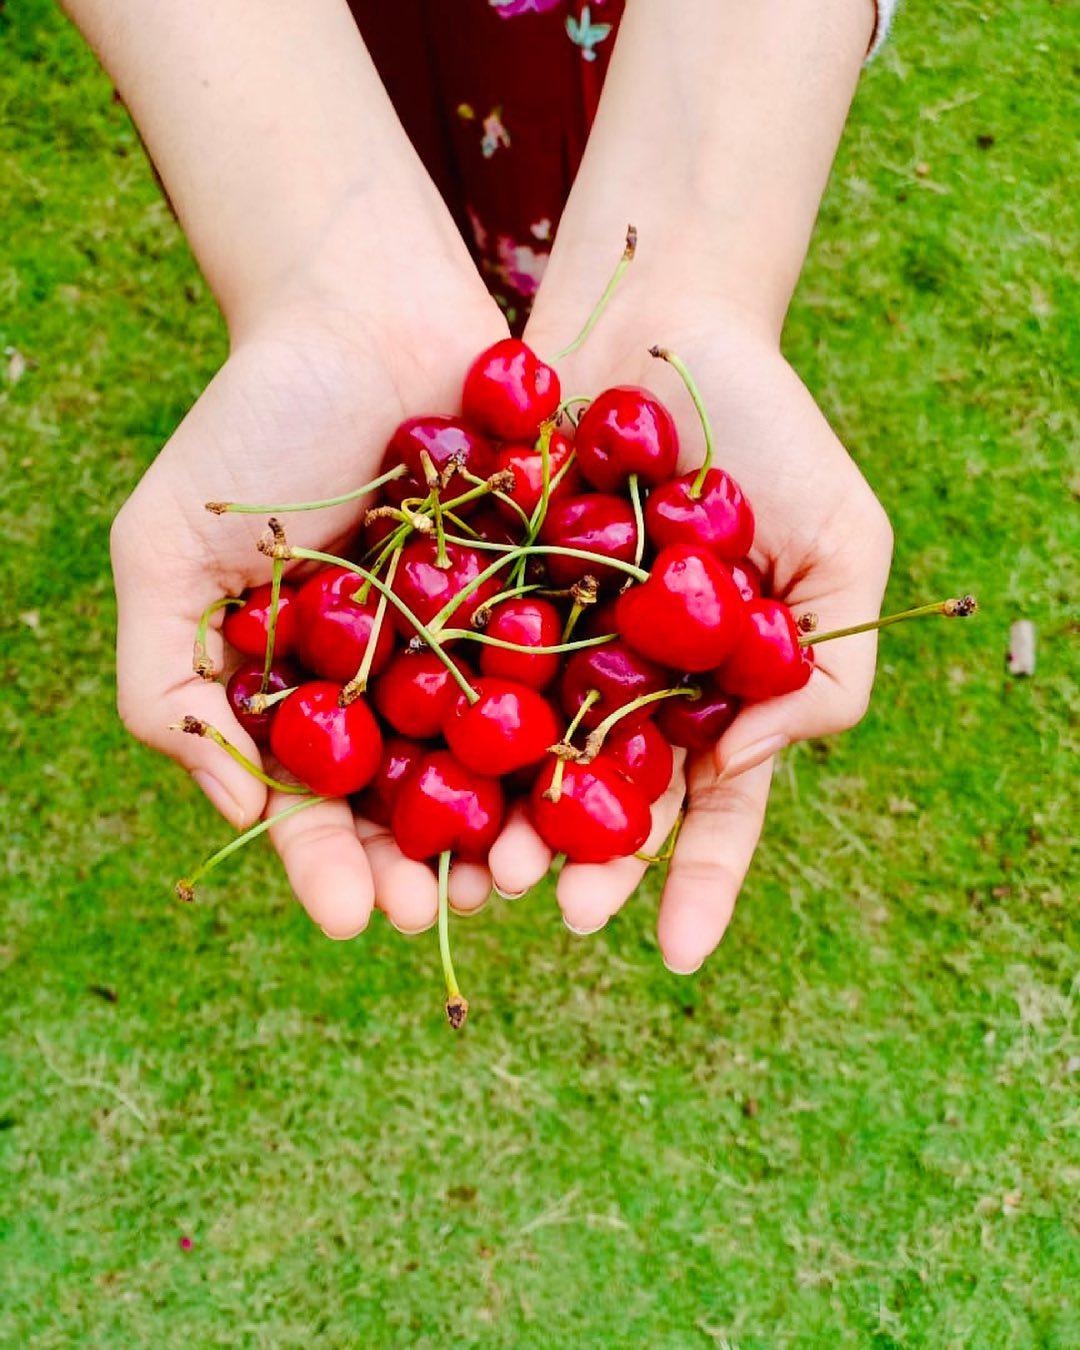 Komal Patel,  cherry, cherries🍒, cherries, hearthealth, antioxidants, vitamin, immunity, immunitybooster, immunitysupport, dietitian, komalpatel, dietitianeats, nutrionist